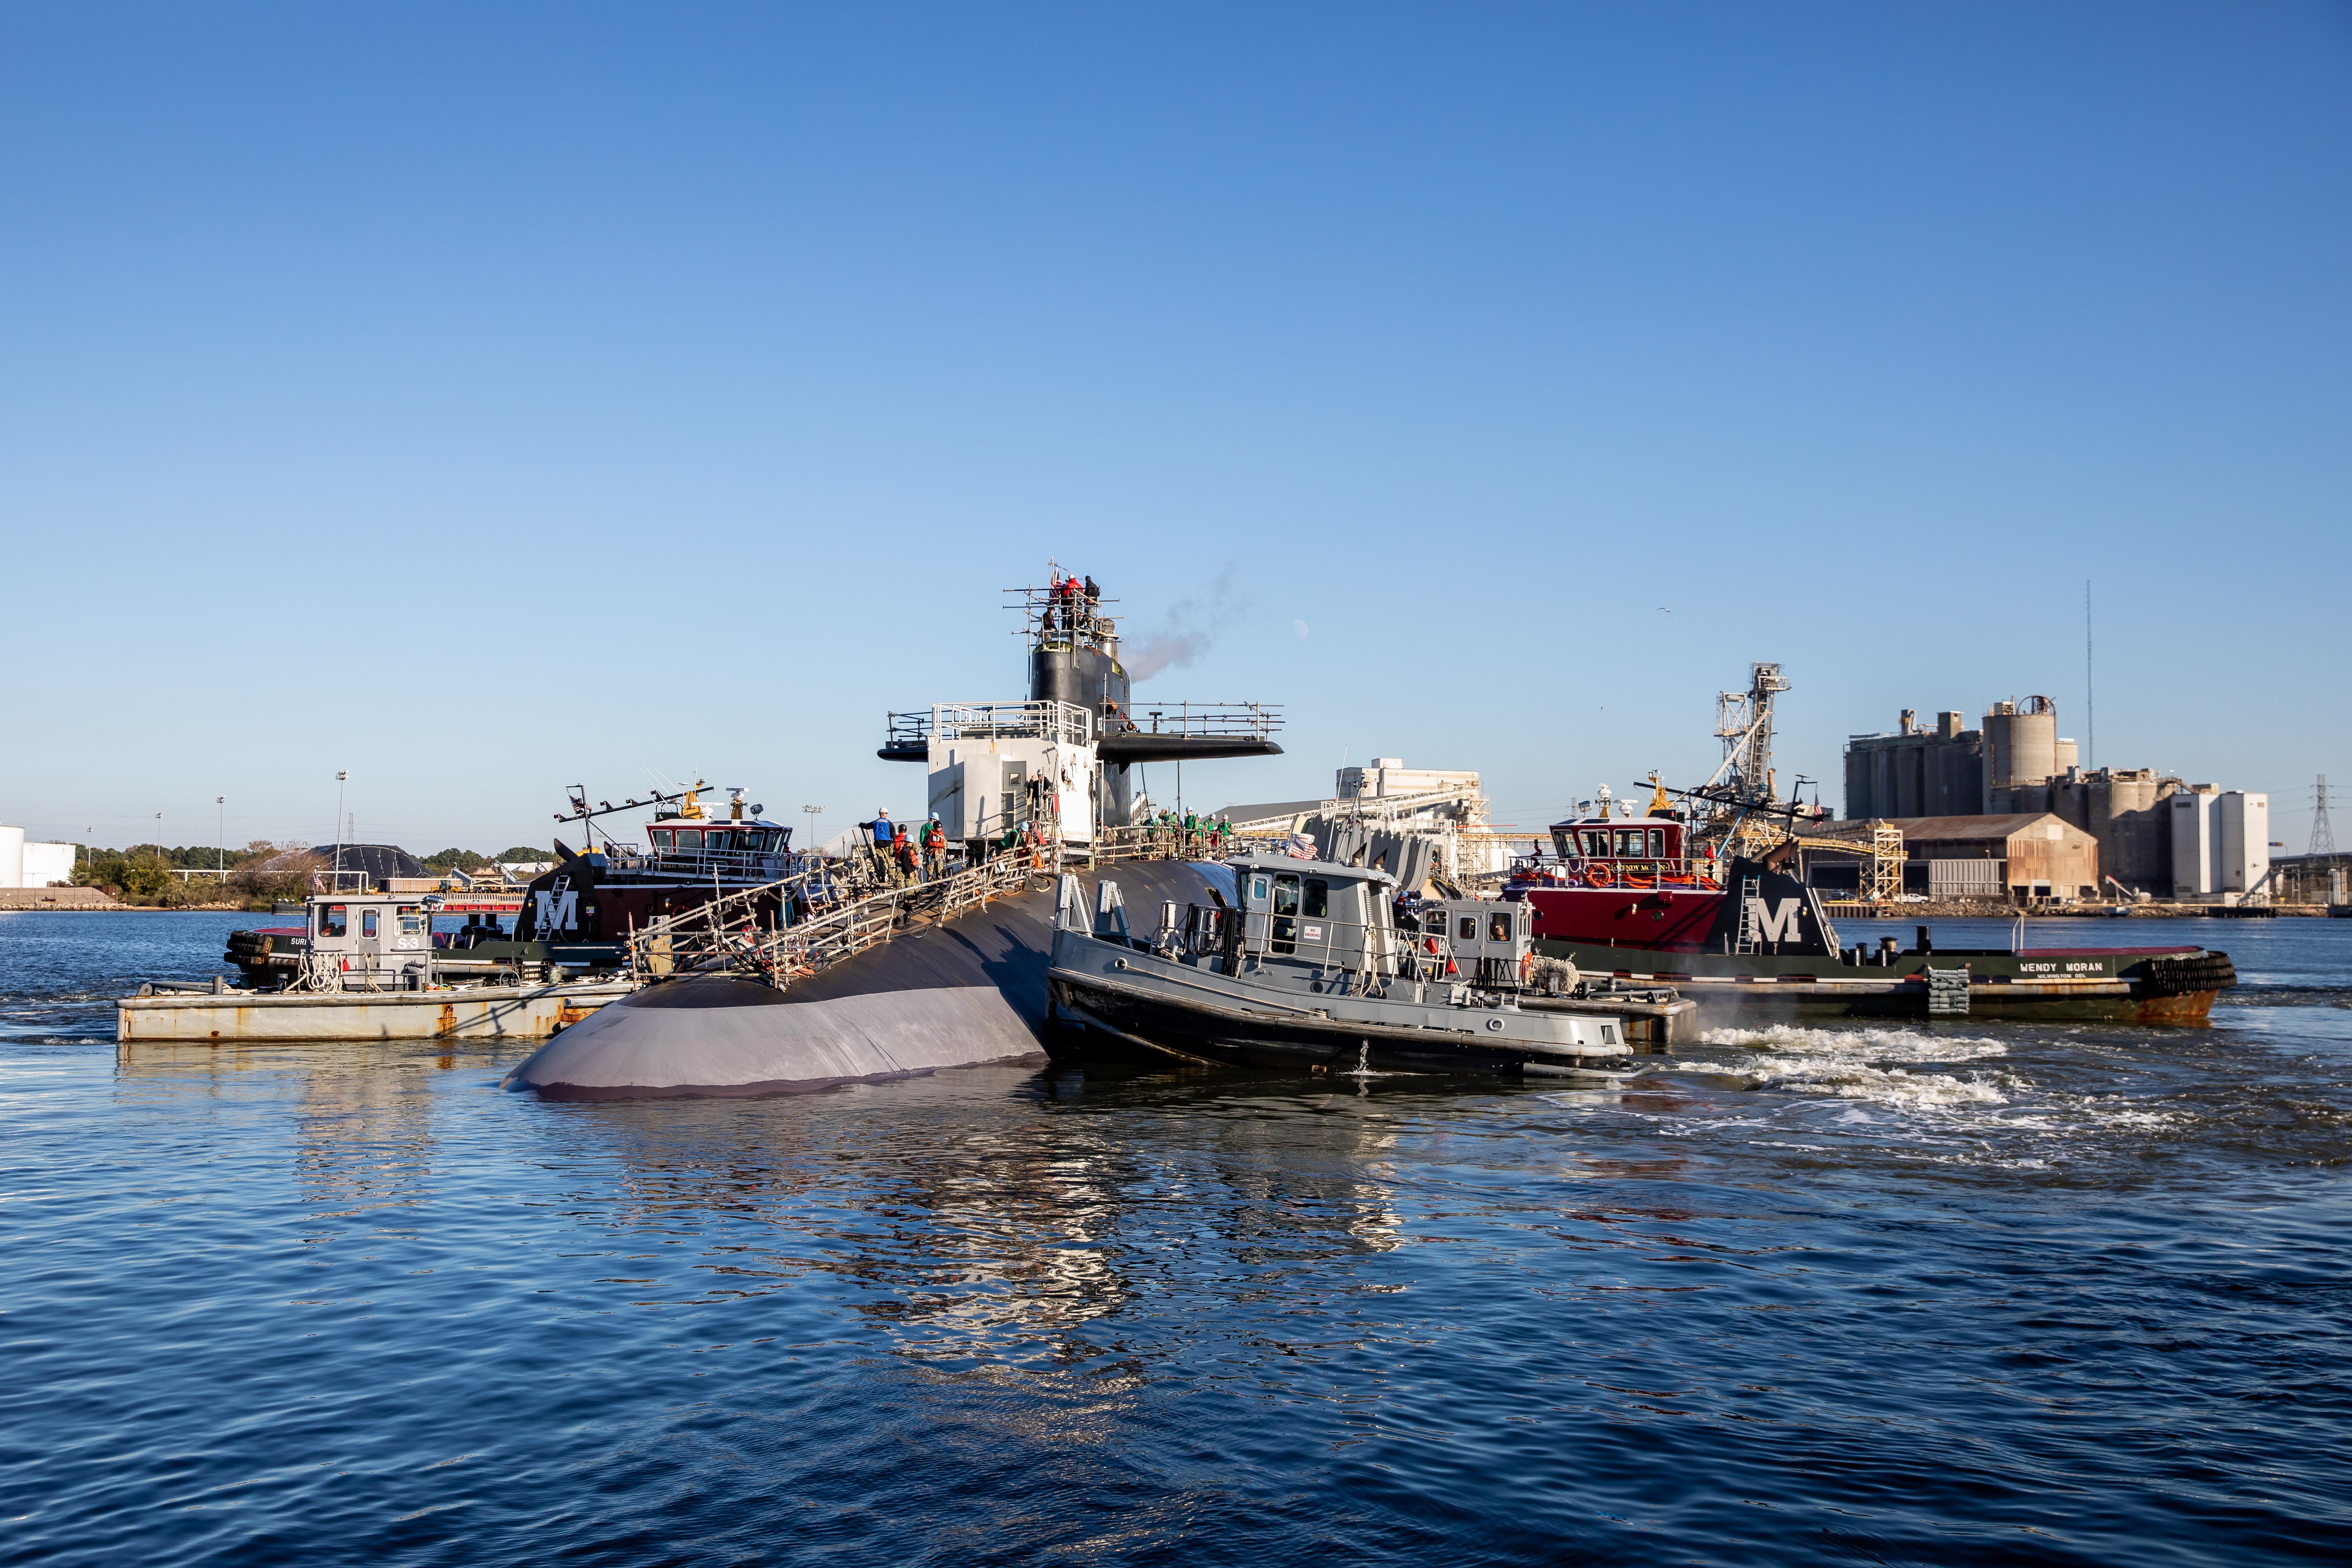 USS Wyoming (SSBN-742) successfully undocked at Norfolk Naval Shipyard (NNSY) Nov. 6, a key milestone in the boat's Engineered Refueling Overhaul (ERO). (Photo by Shelby West, Norfolk Naval Shipyard Photographer)